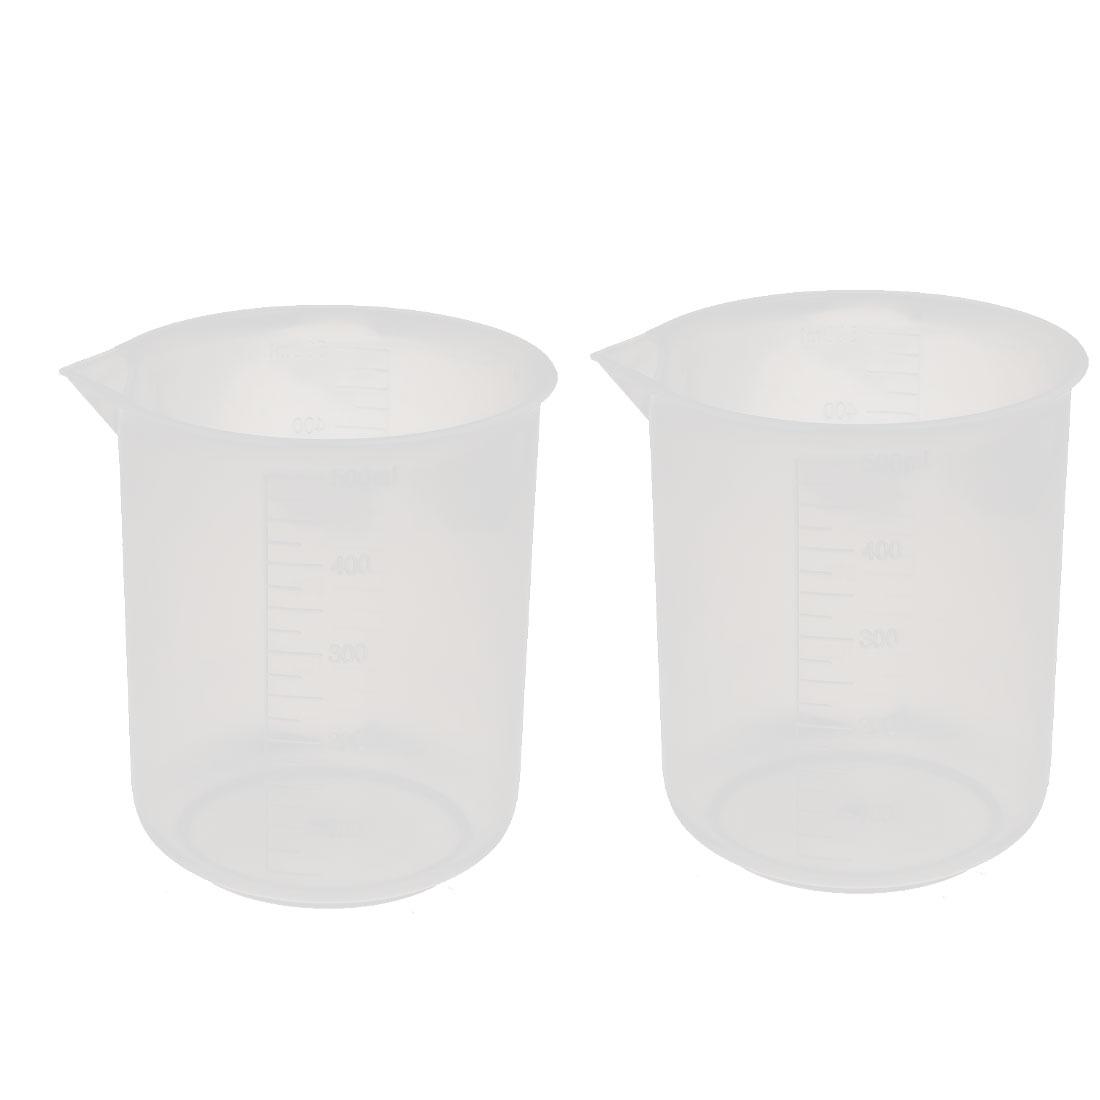 2pcs 500mL Laboratory Plastic Liquid Container Measuring Cup Beaker Clear